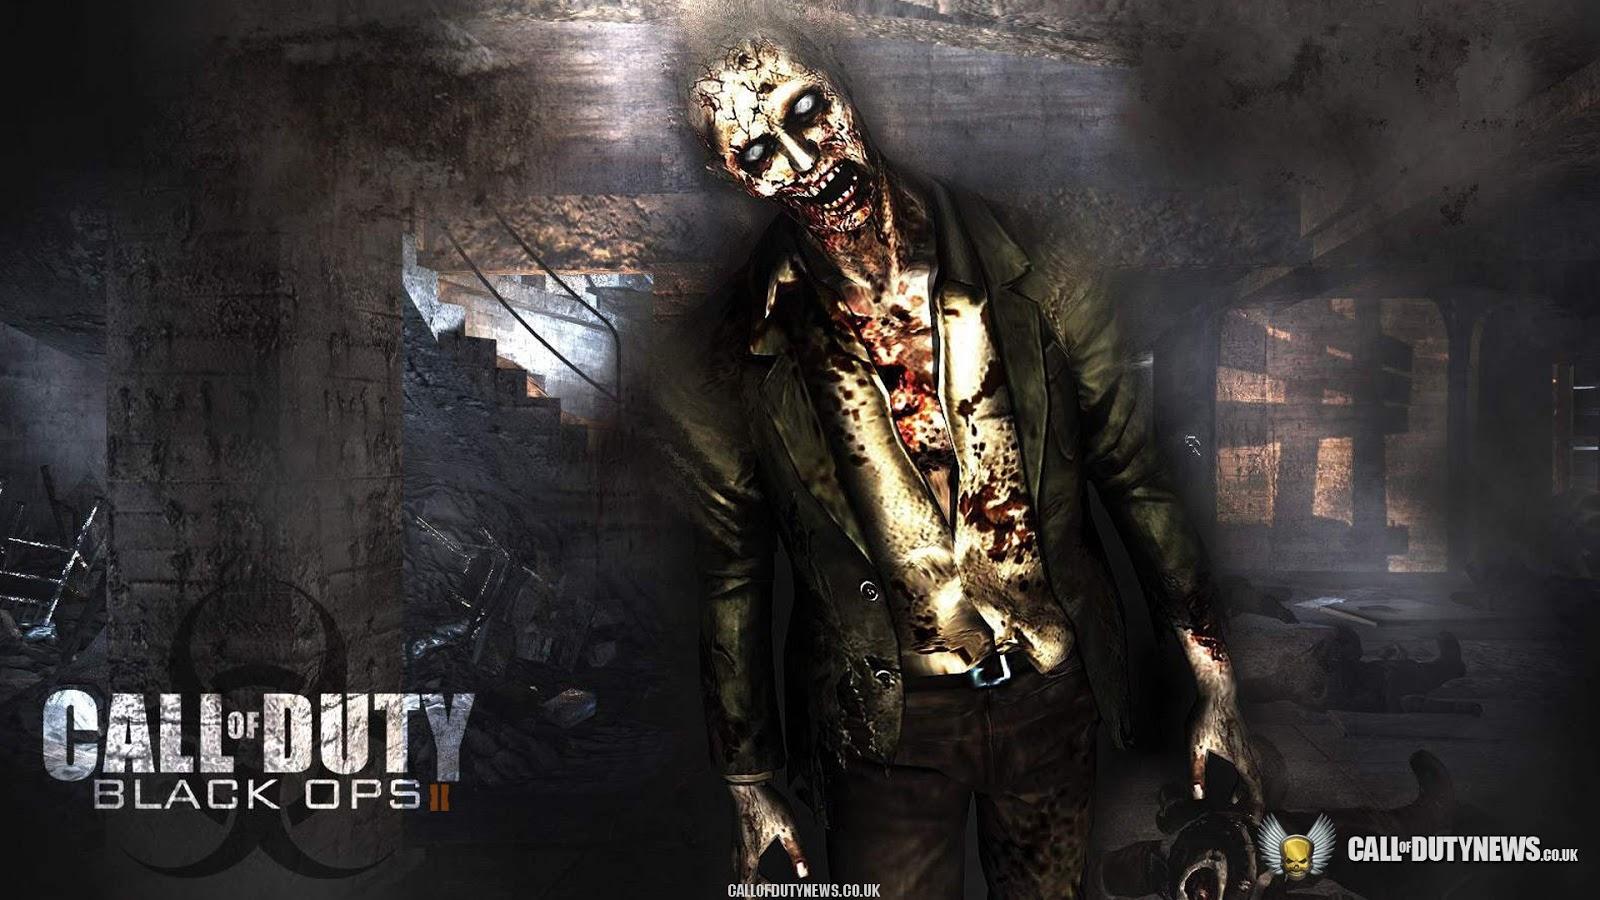 http://3.bp.blogspot.com/-pYmp66xaAt4/UO9F8iJjRSI/AAAAAAAAAfk/ozsdWA8h7VQ/s1600/black-ops-2-wallpaper-71-zombie.jpg